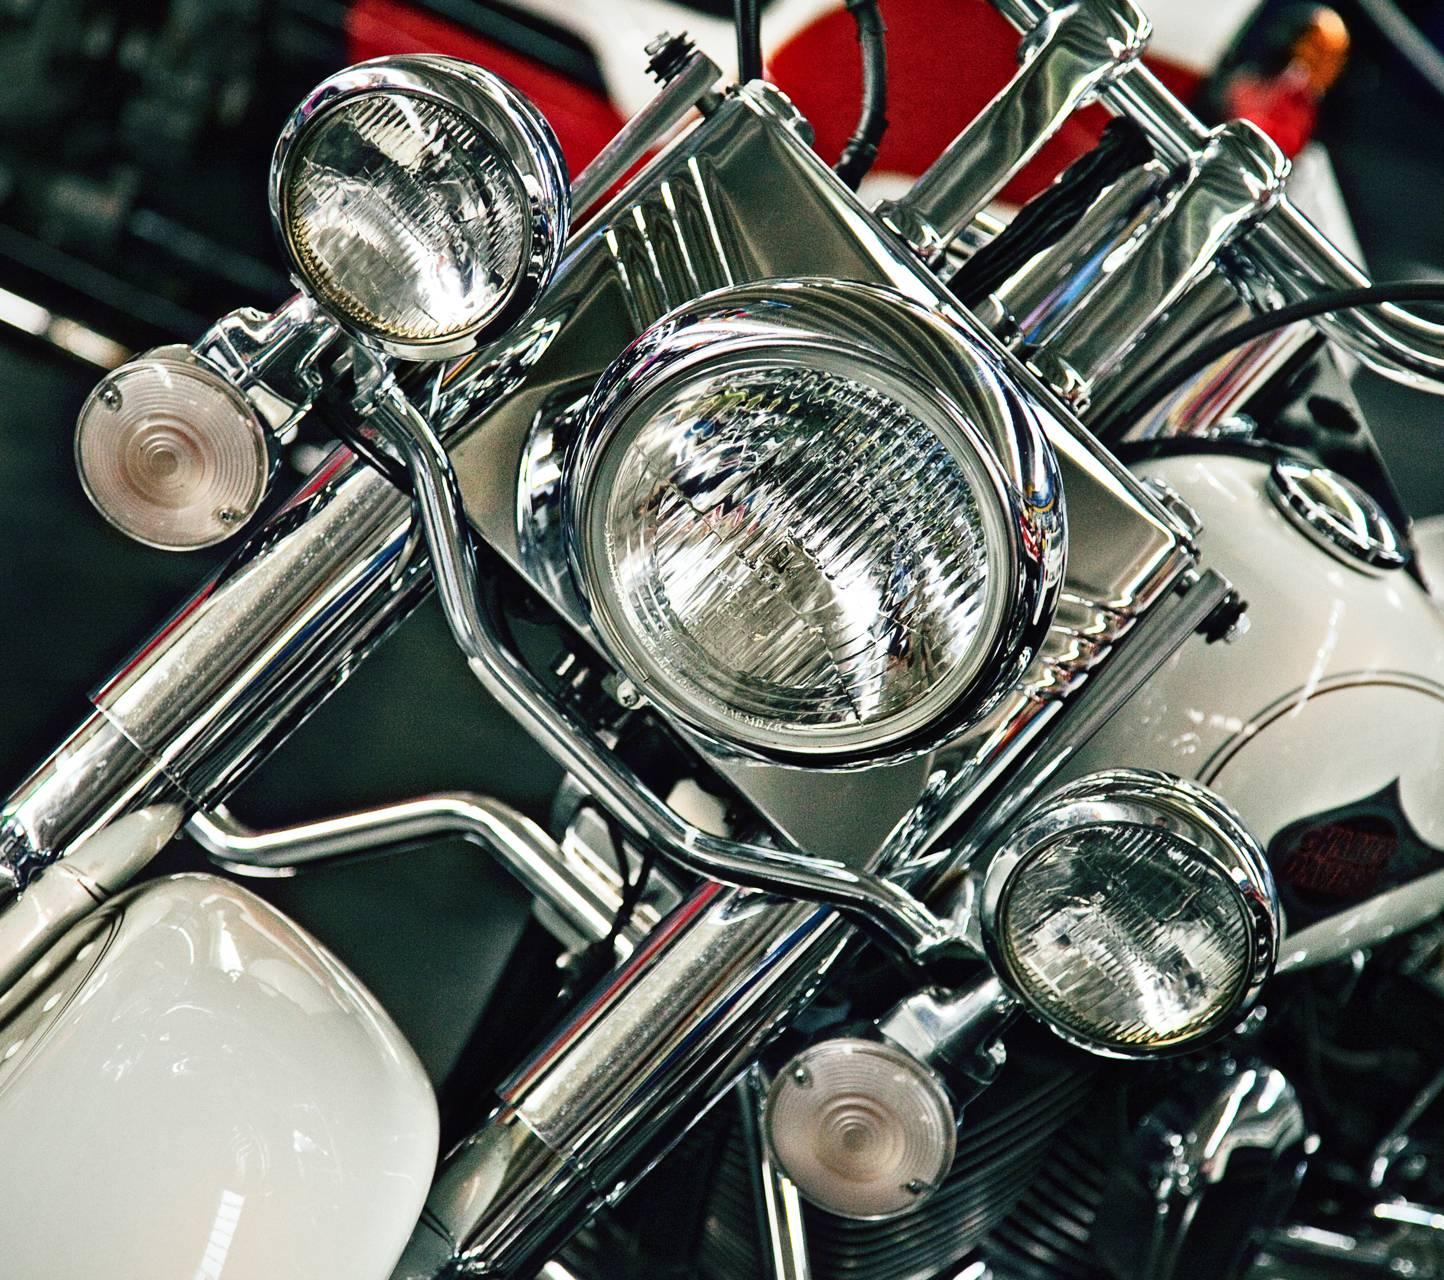 A Harley 5